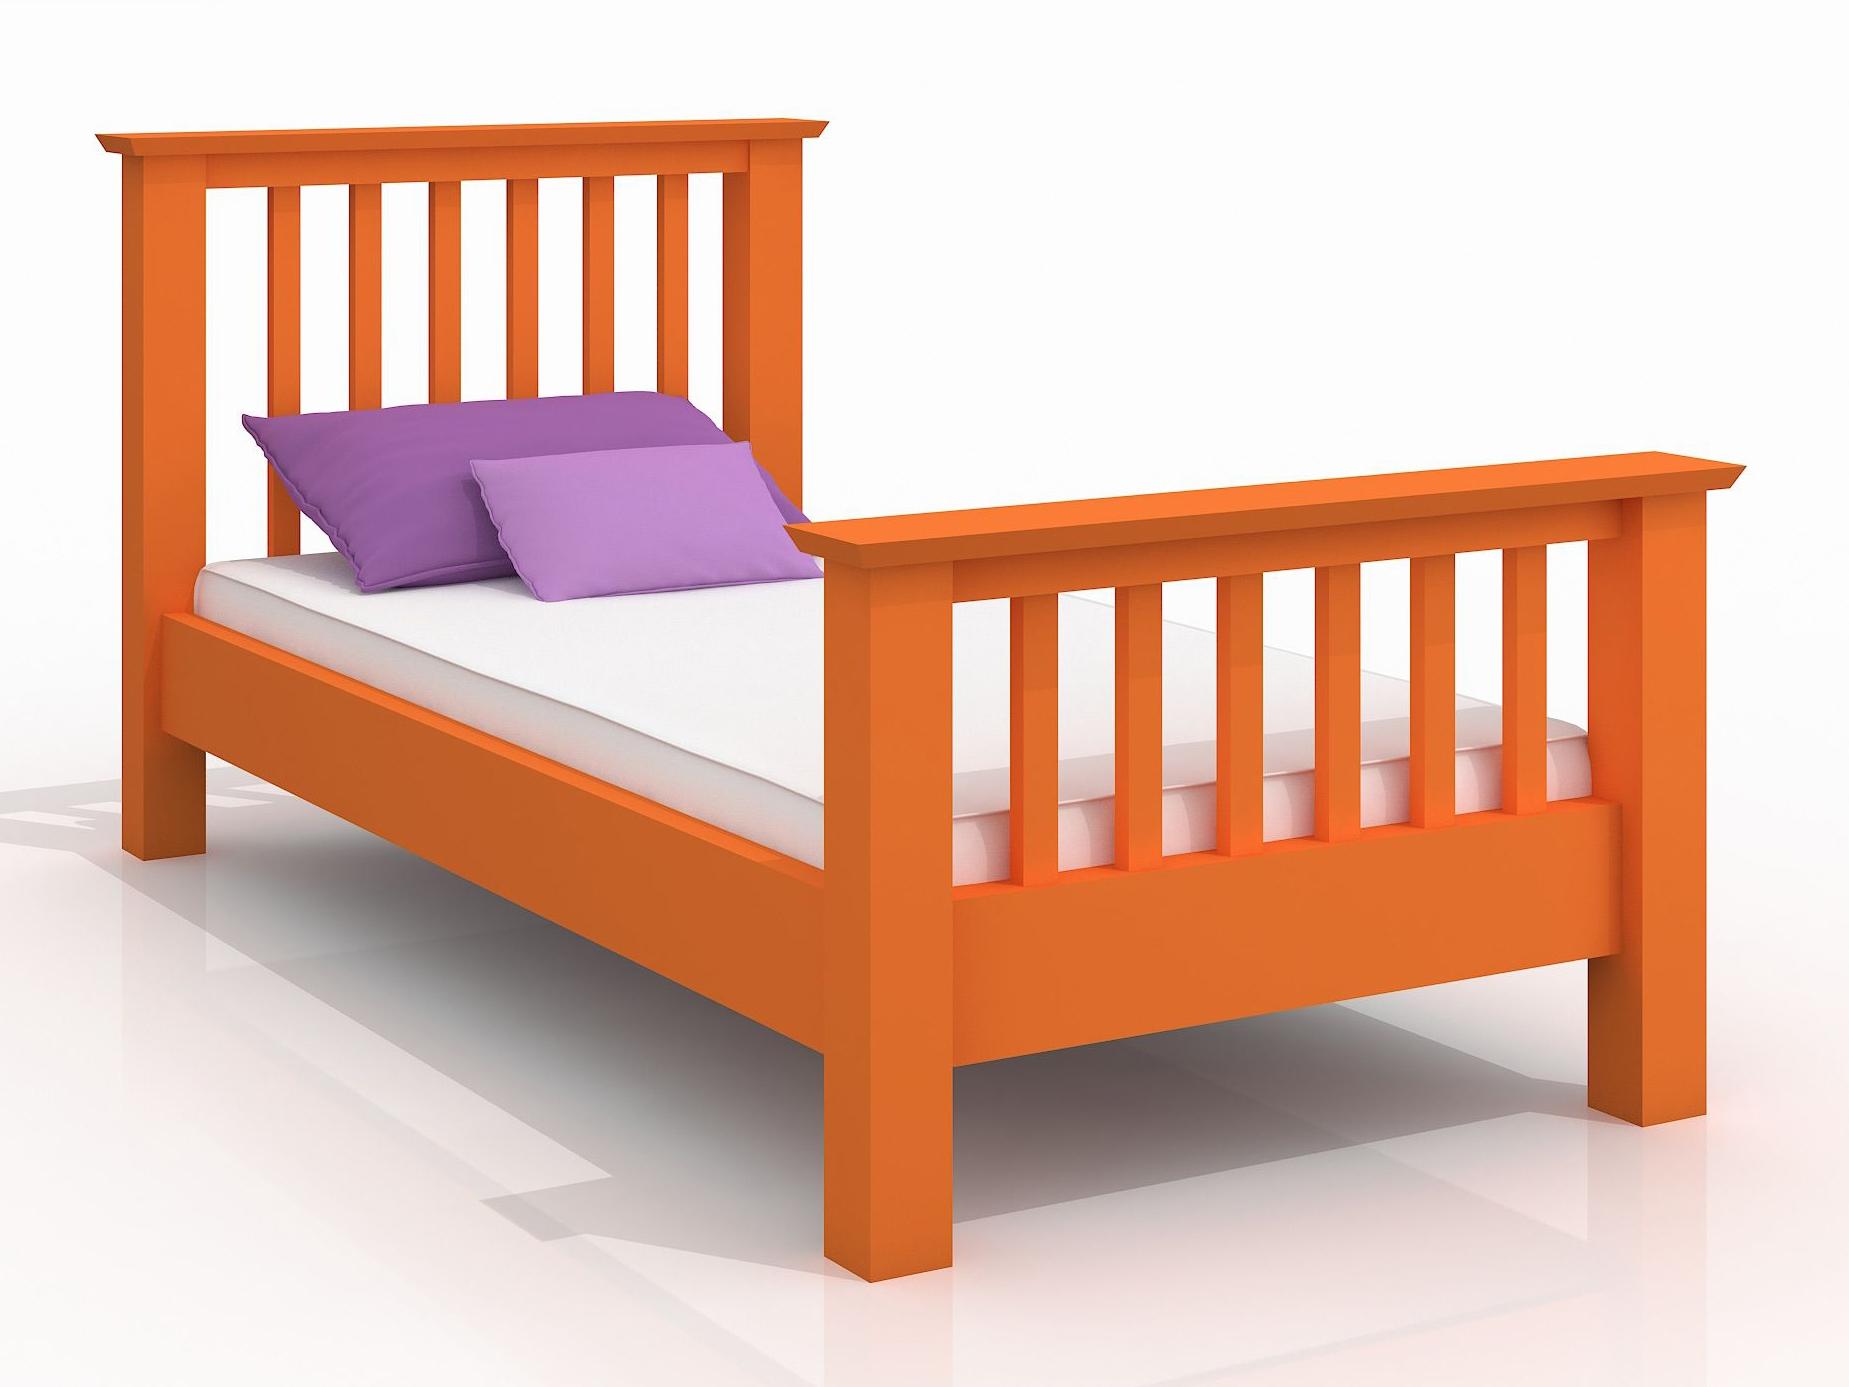 Jednolůžková postel 90 cm - Naturlig Kids - Leikanger (borovice) (s roštem)